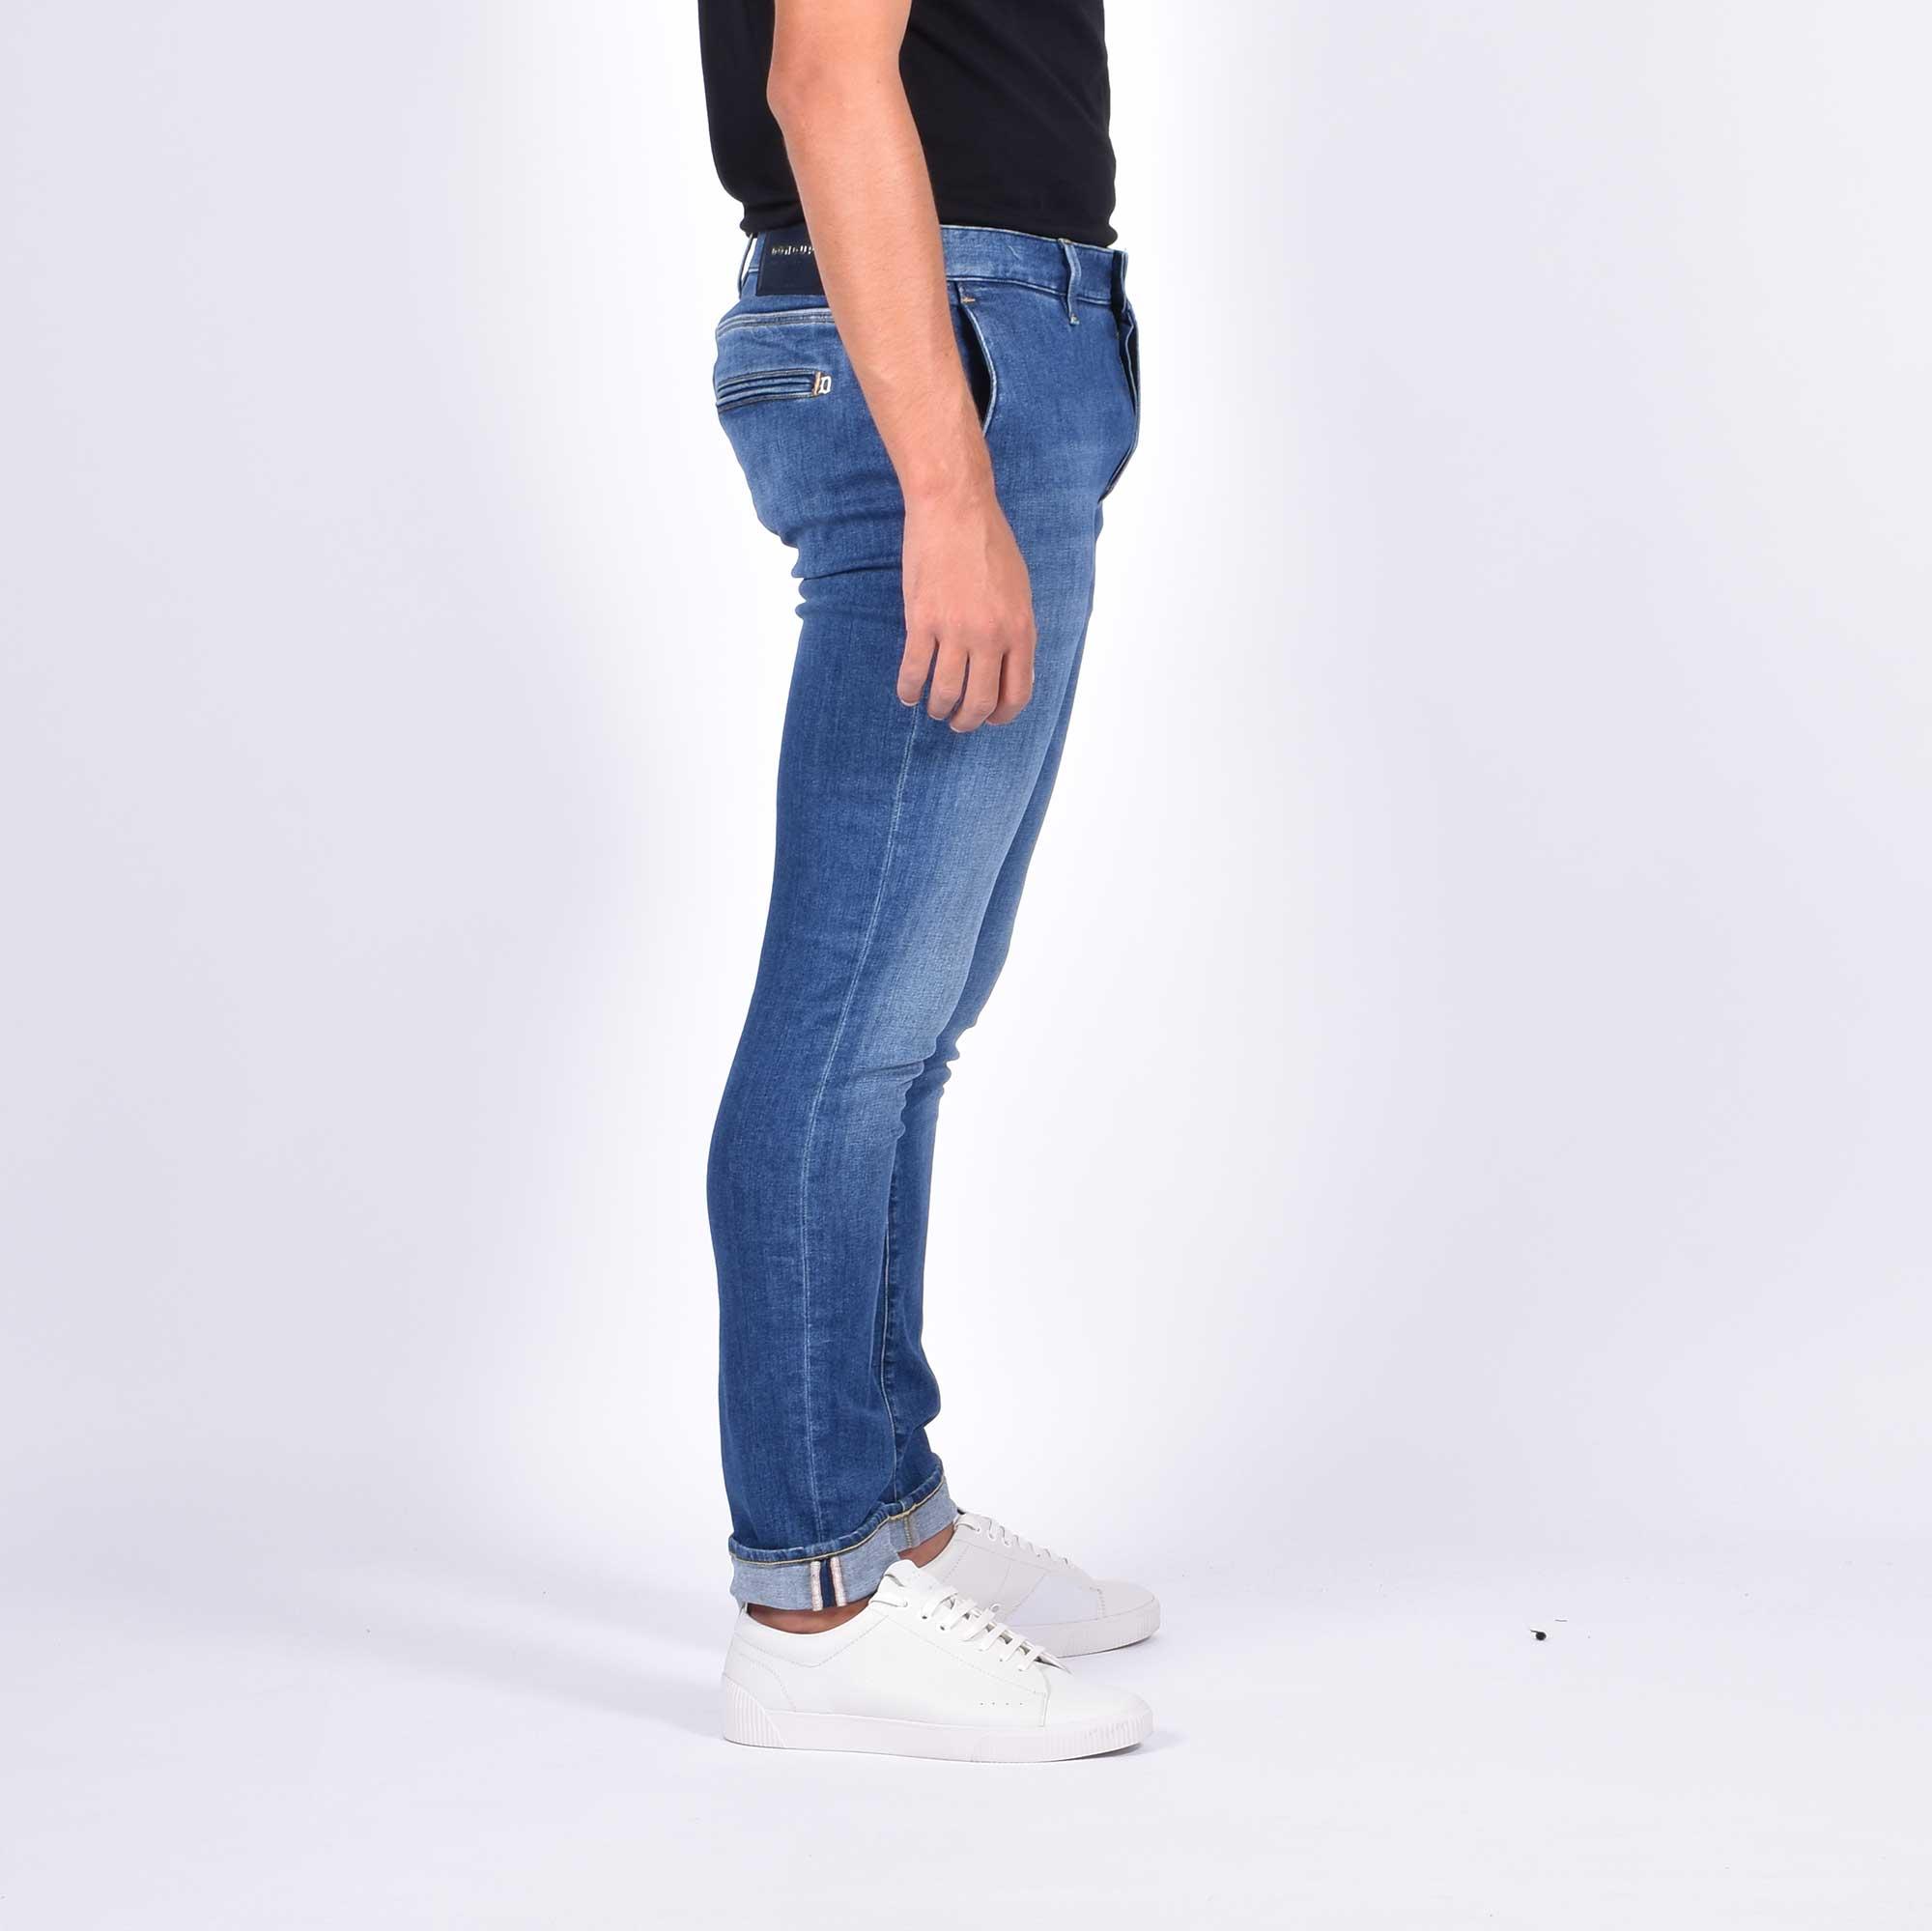 Jeans chester luxury - Denim medio